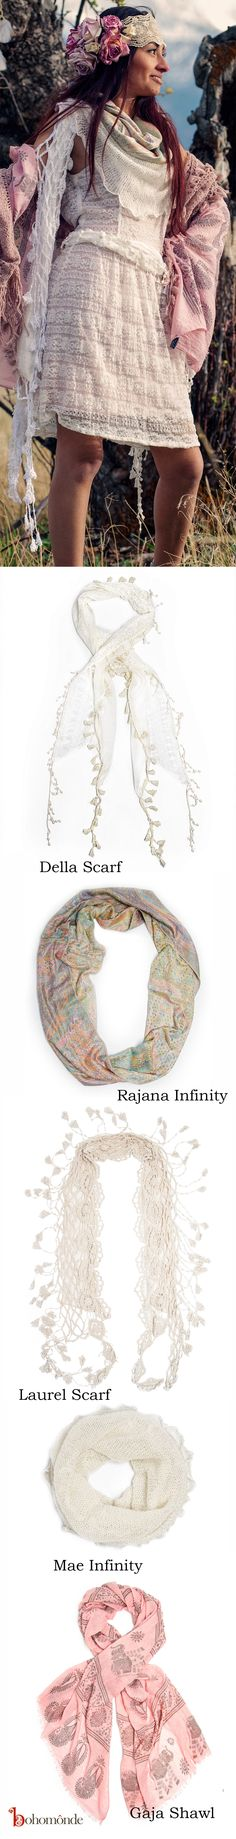 Boho fashion set, with some beautiful fashion scarf boho accessories:  Della Scarf - http://amzn.to/1InpnC1  Rajana Infinity - http://amzn.to/1Bs4fIS  Laurel Scarf - http://amzn.to/1s3f6Gi  Mae Infinity - http://amzn.to/1yZ2y2k  Gaja Shawl - http://amzn.to/12CyfCE